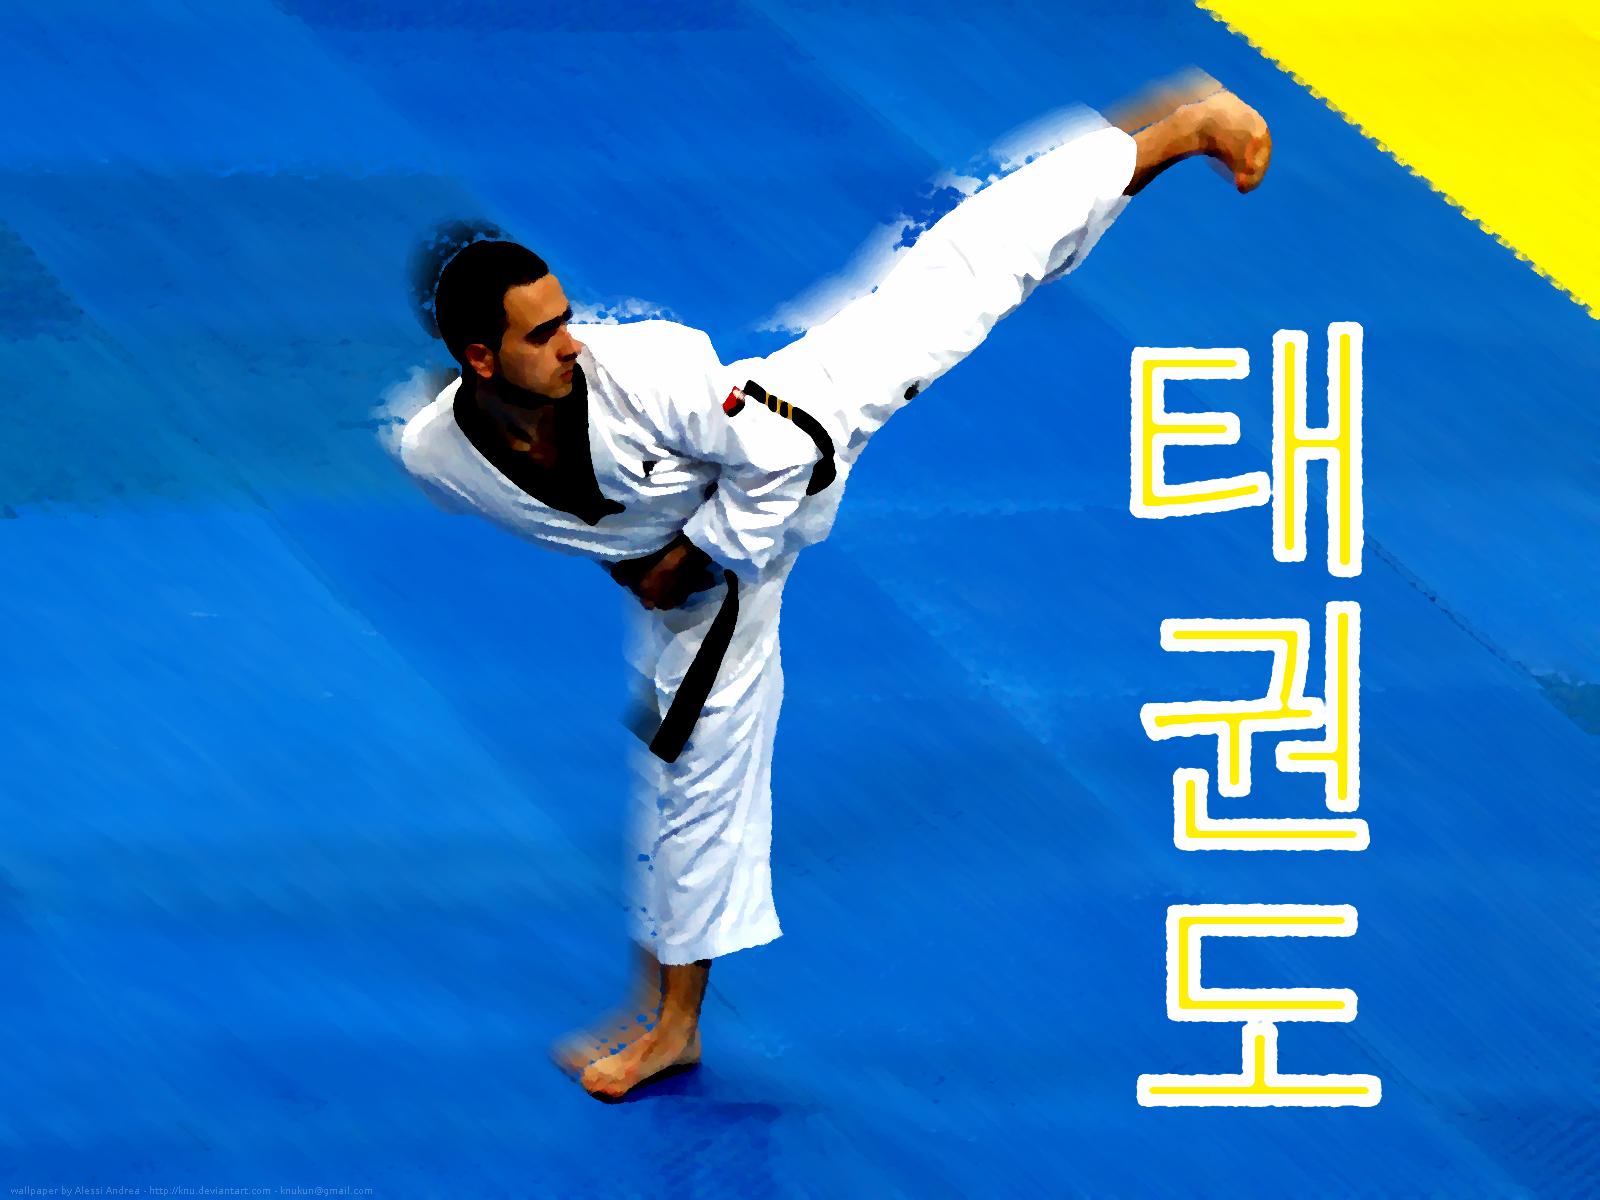 Taekwondo wallpaper 1 by Knu 1600x1200